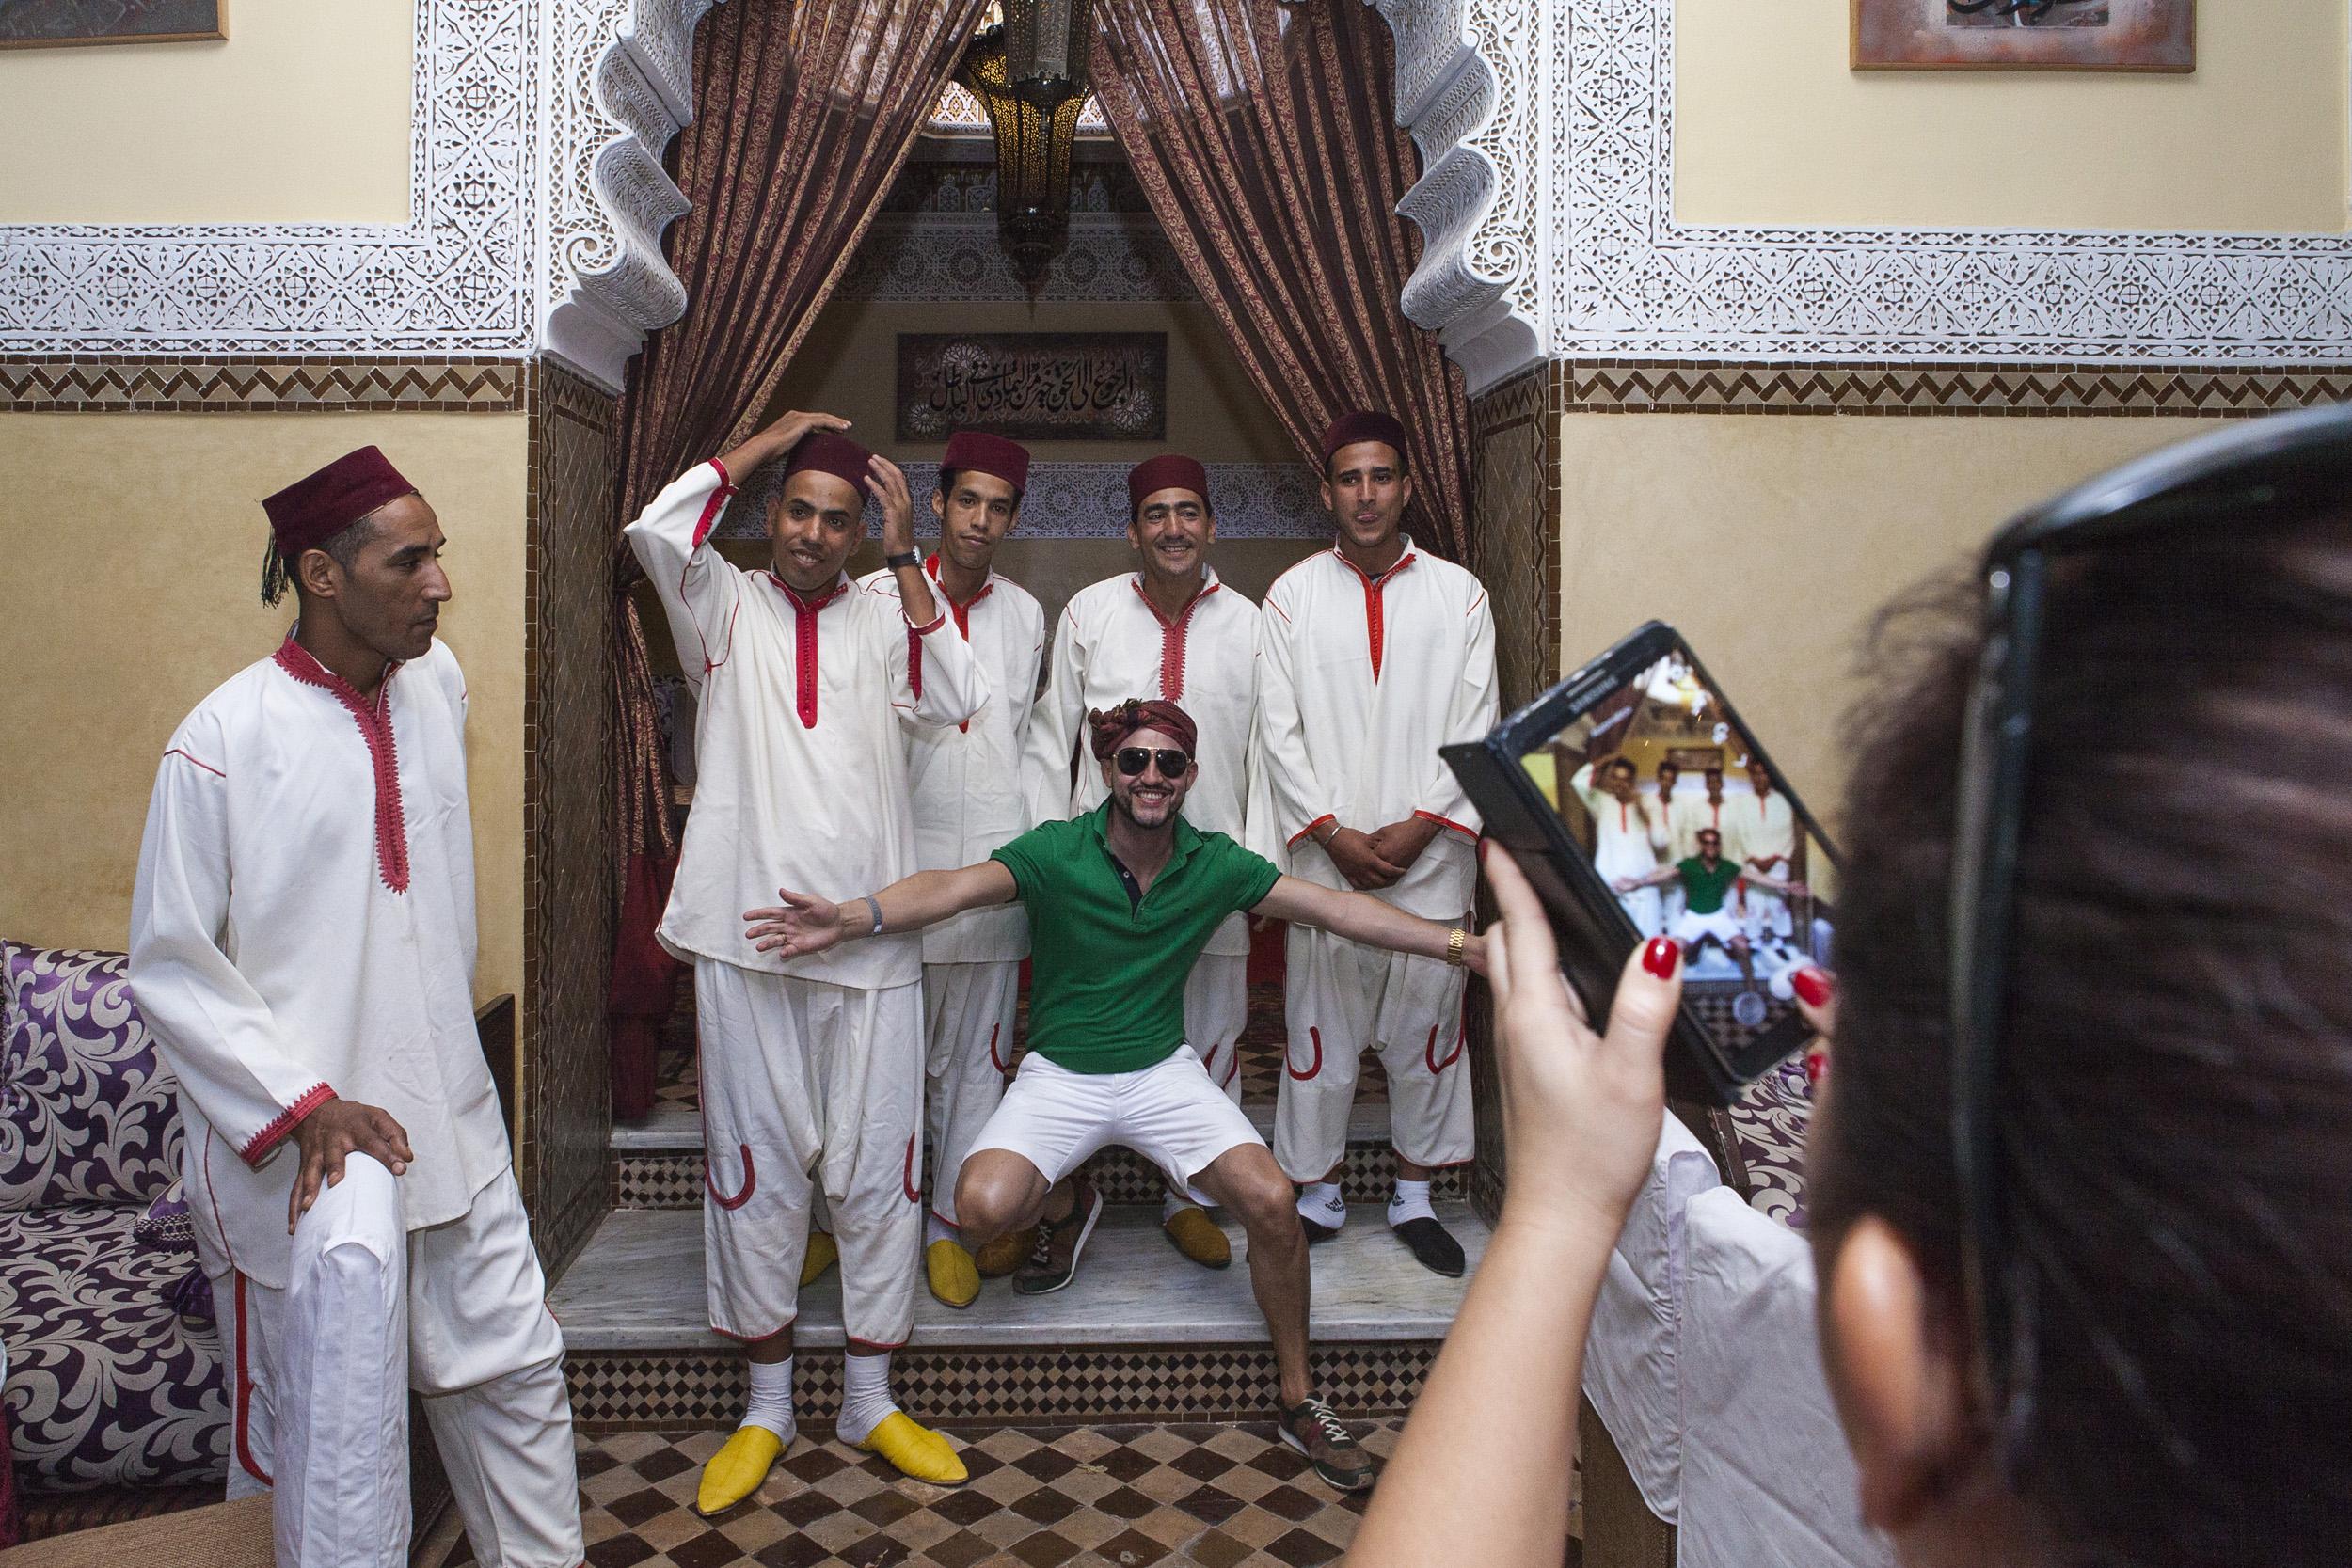 marrakech_2_convencion_anual_salerm_cosmetics_proline_10